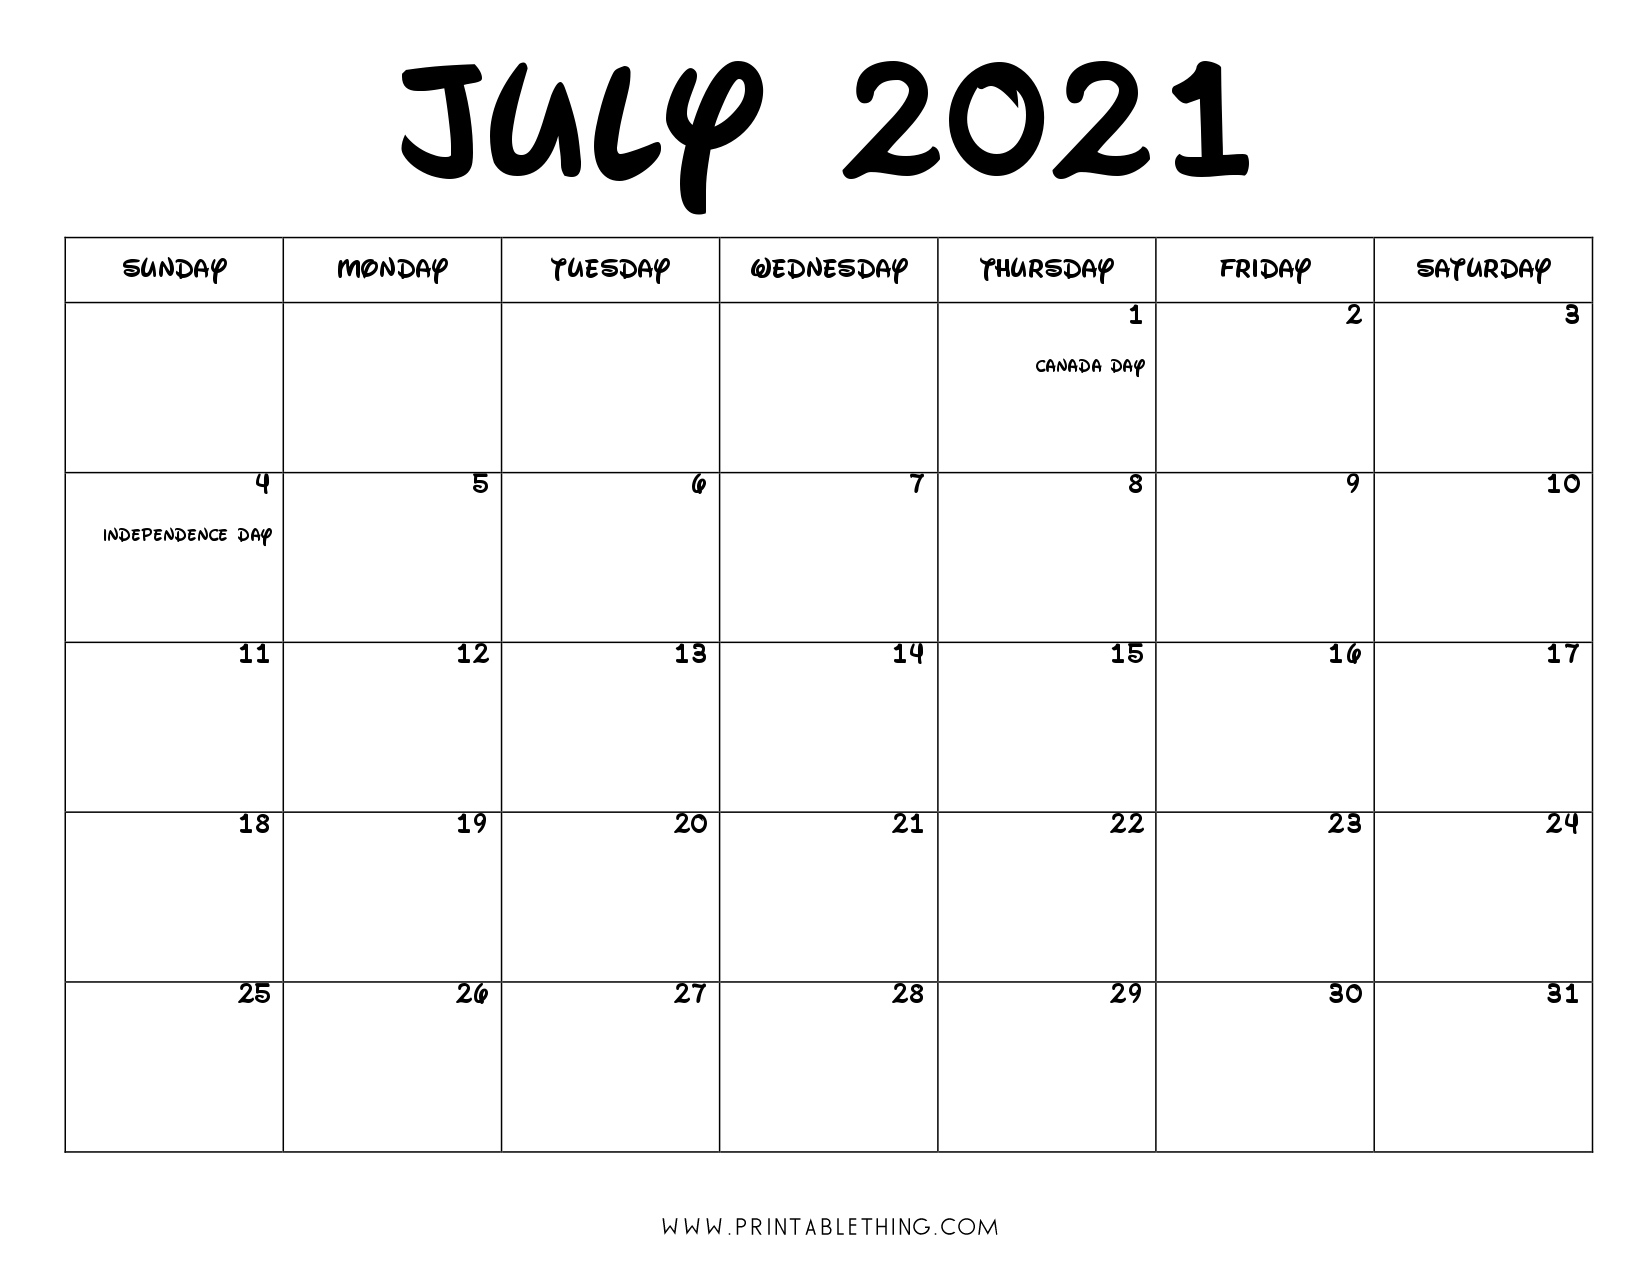 July 2021 Calendar Pdf, July 2021 Calendar Image, Print Pdf & Image July 2021 Tithi Calendar